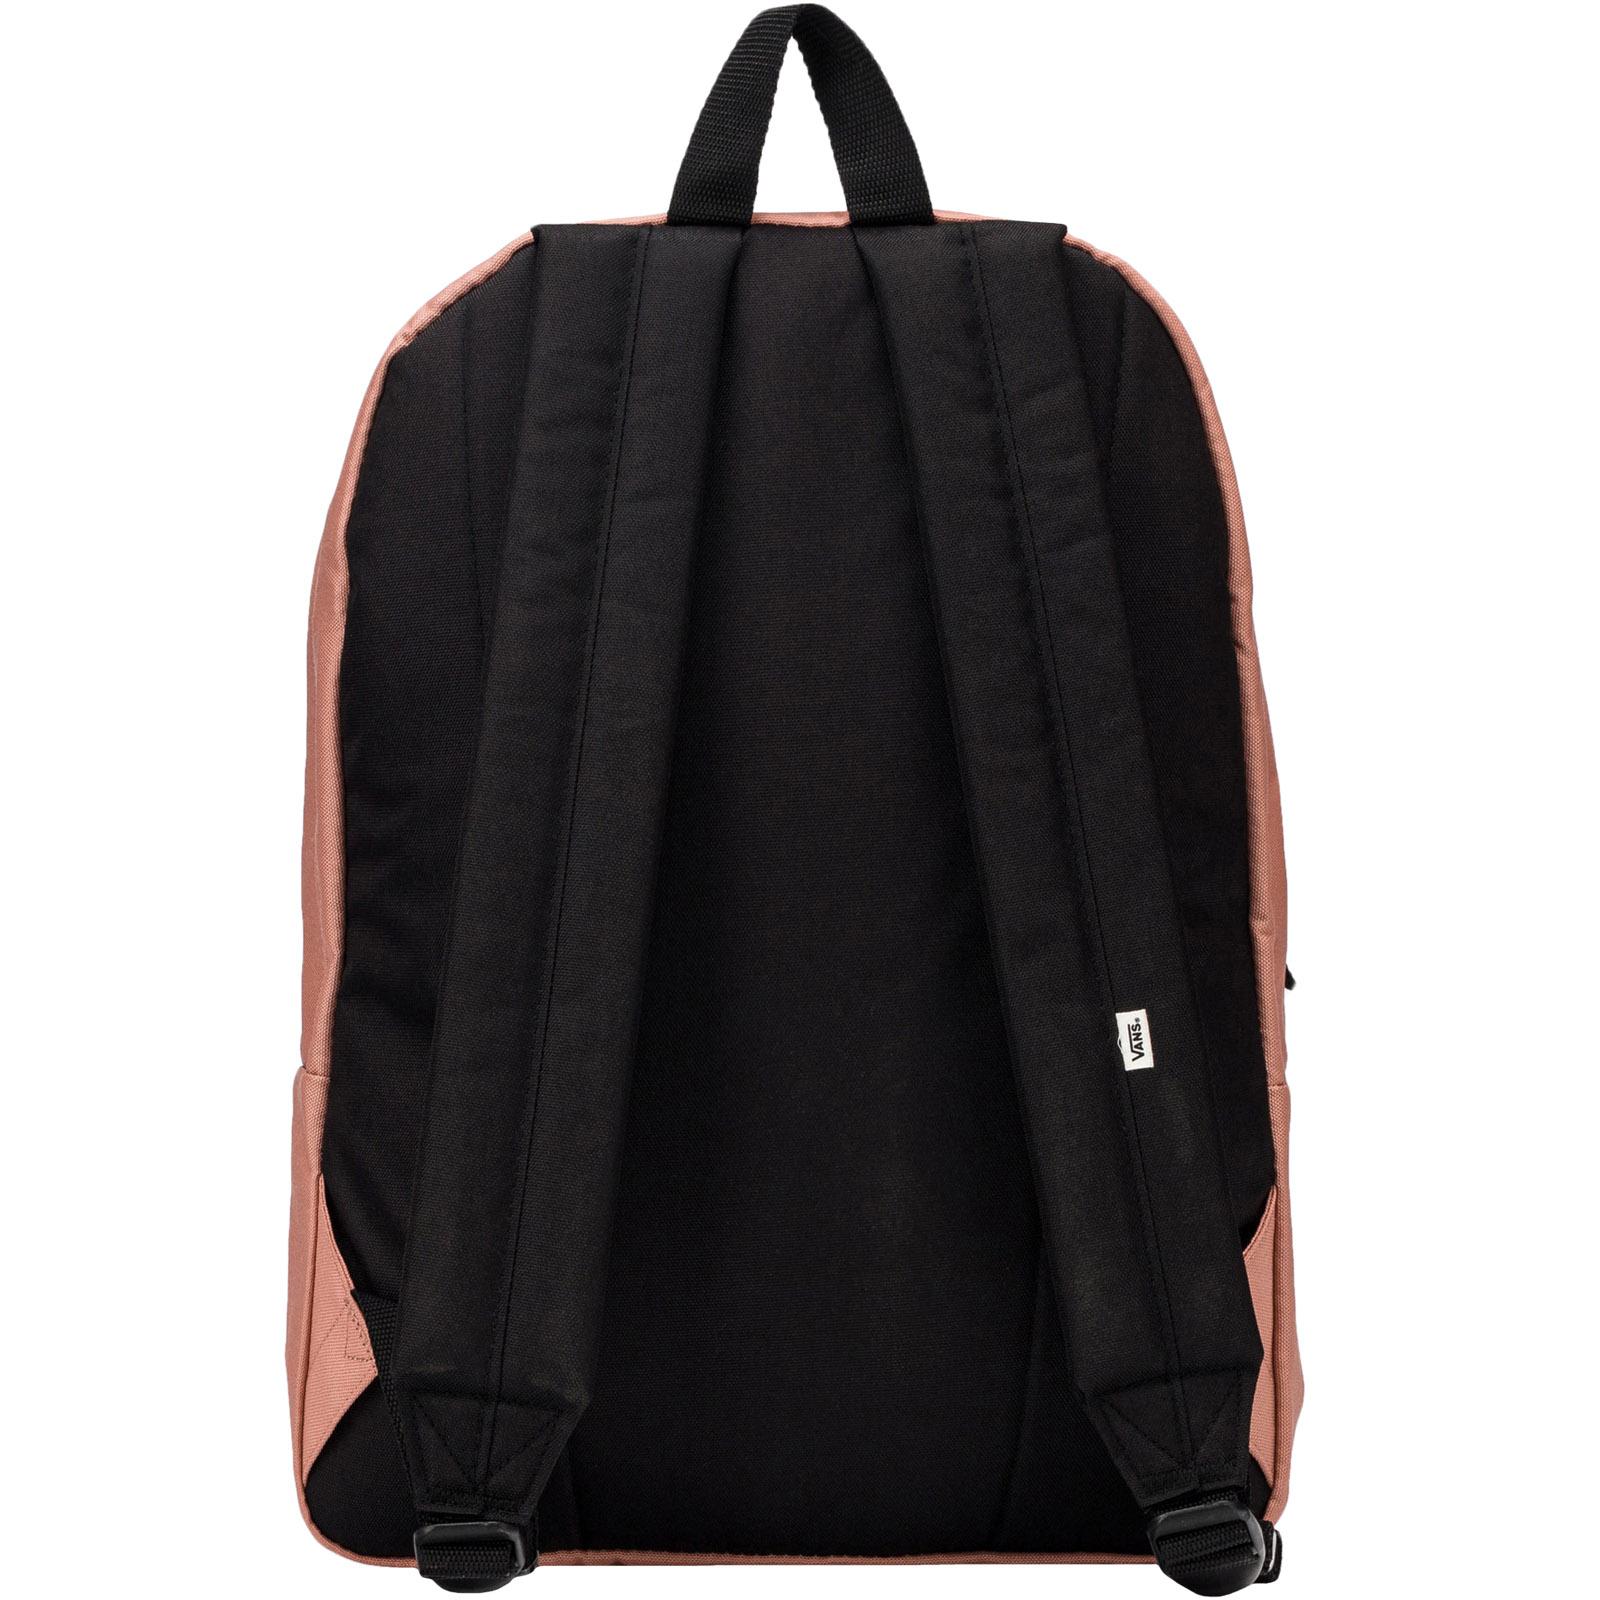 thumbnail 5 - Vans Unisex Realm Two Strap Adjustable School College Rucksack Backpack Bag